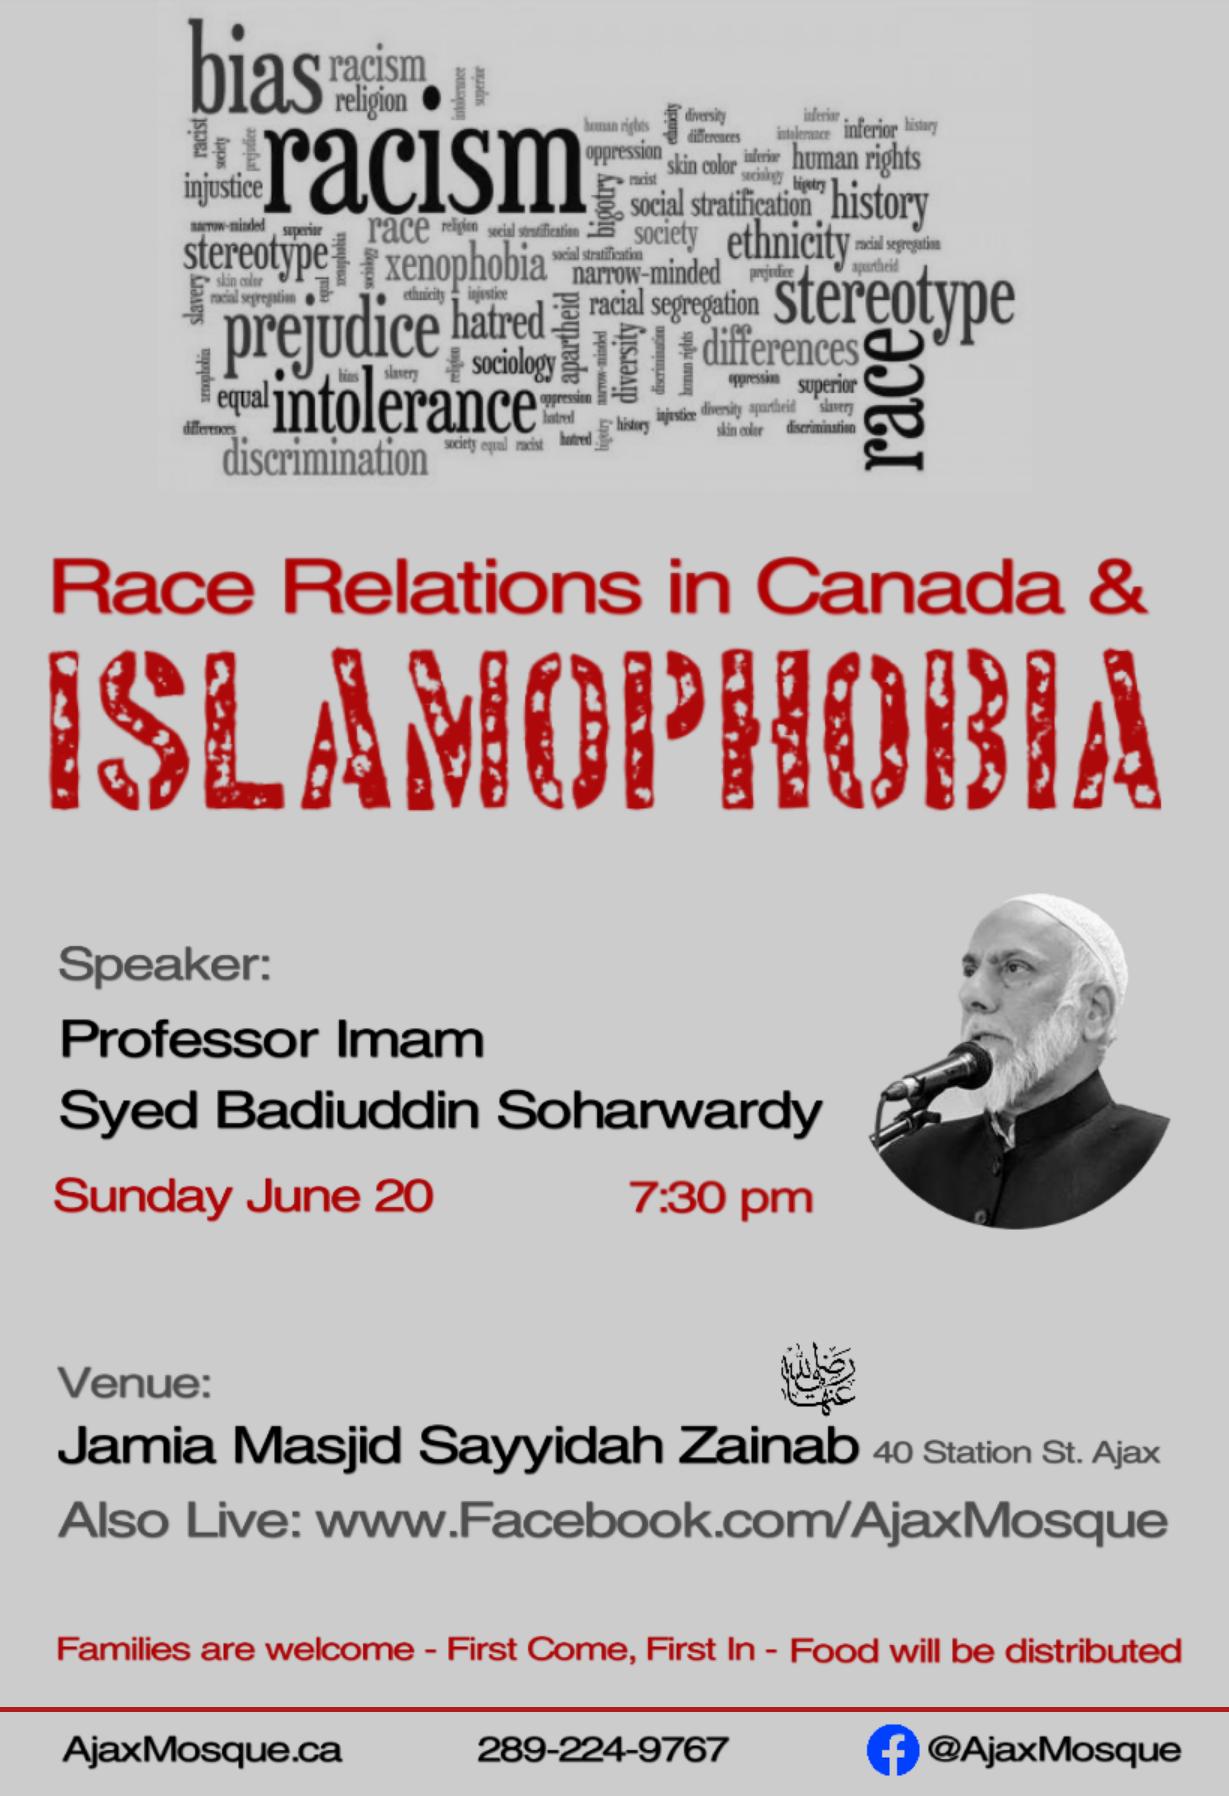 Race Relations in Canada & Islamophobia